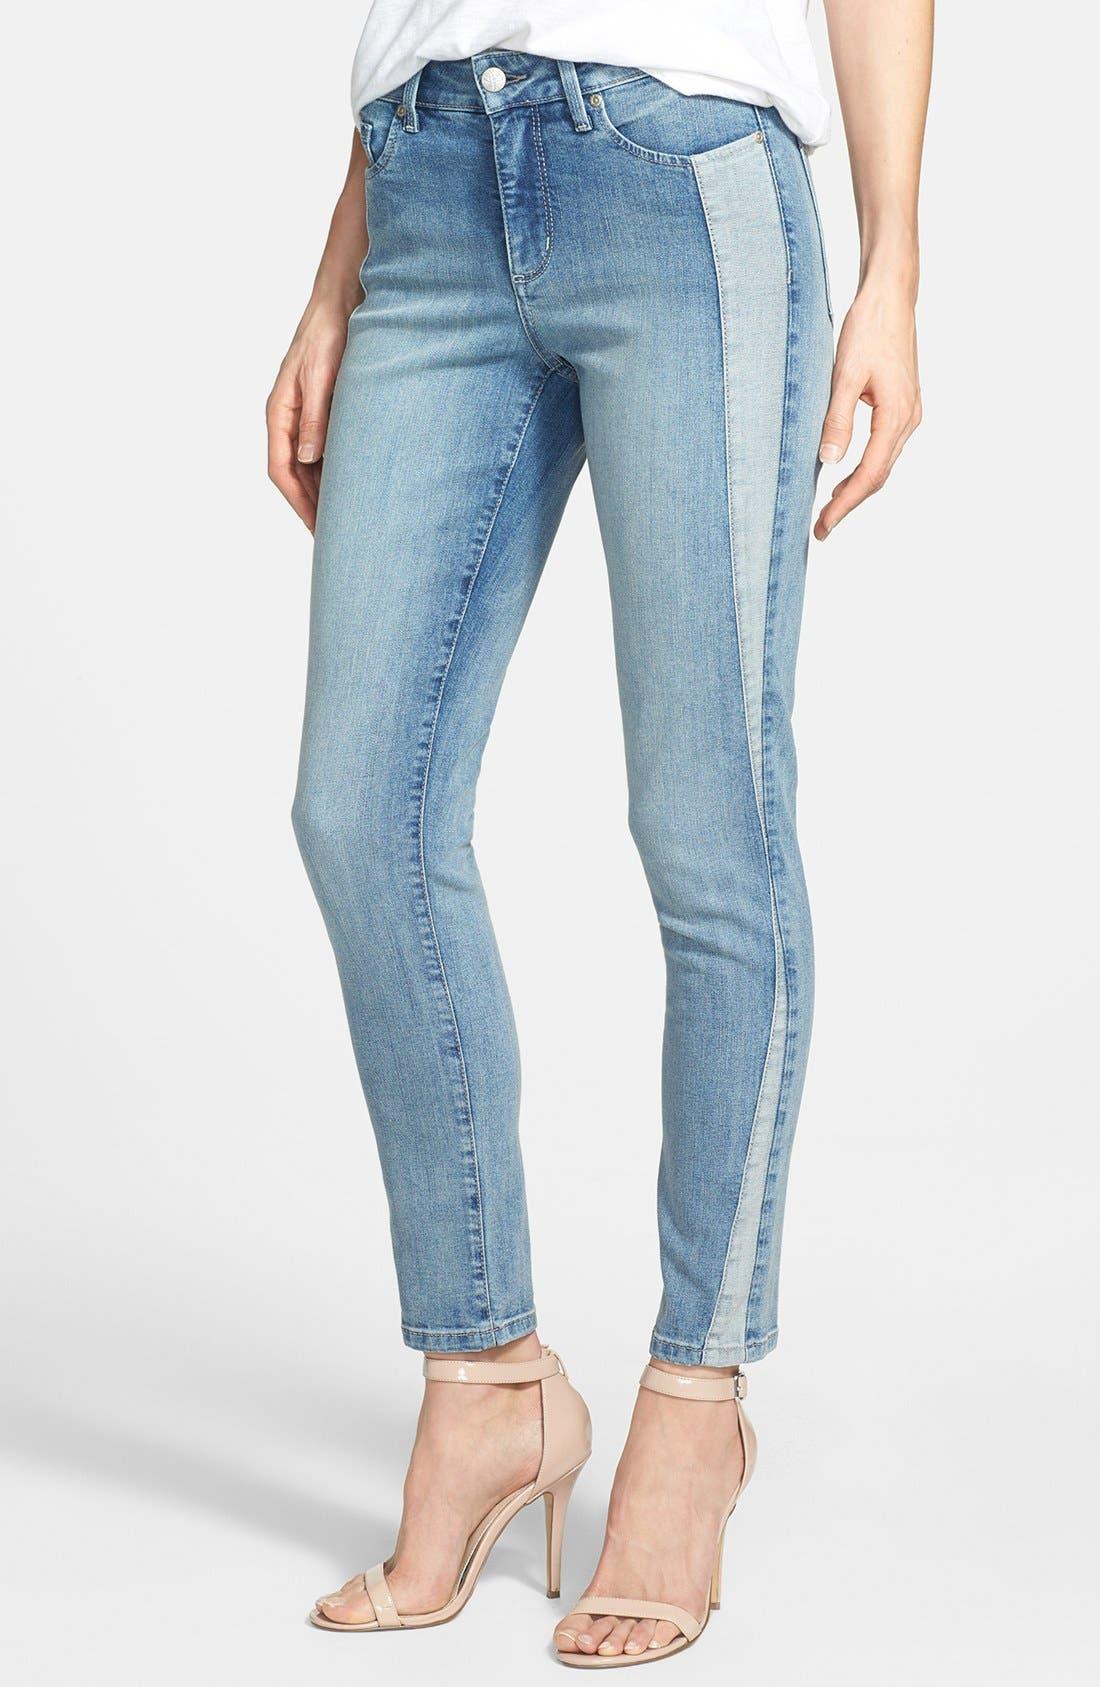 Main Image - NYDJ 'Annalynn' Side Inset Stretch Skinny Jeans (Stockton) (Regular & Petite)